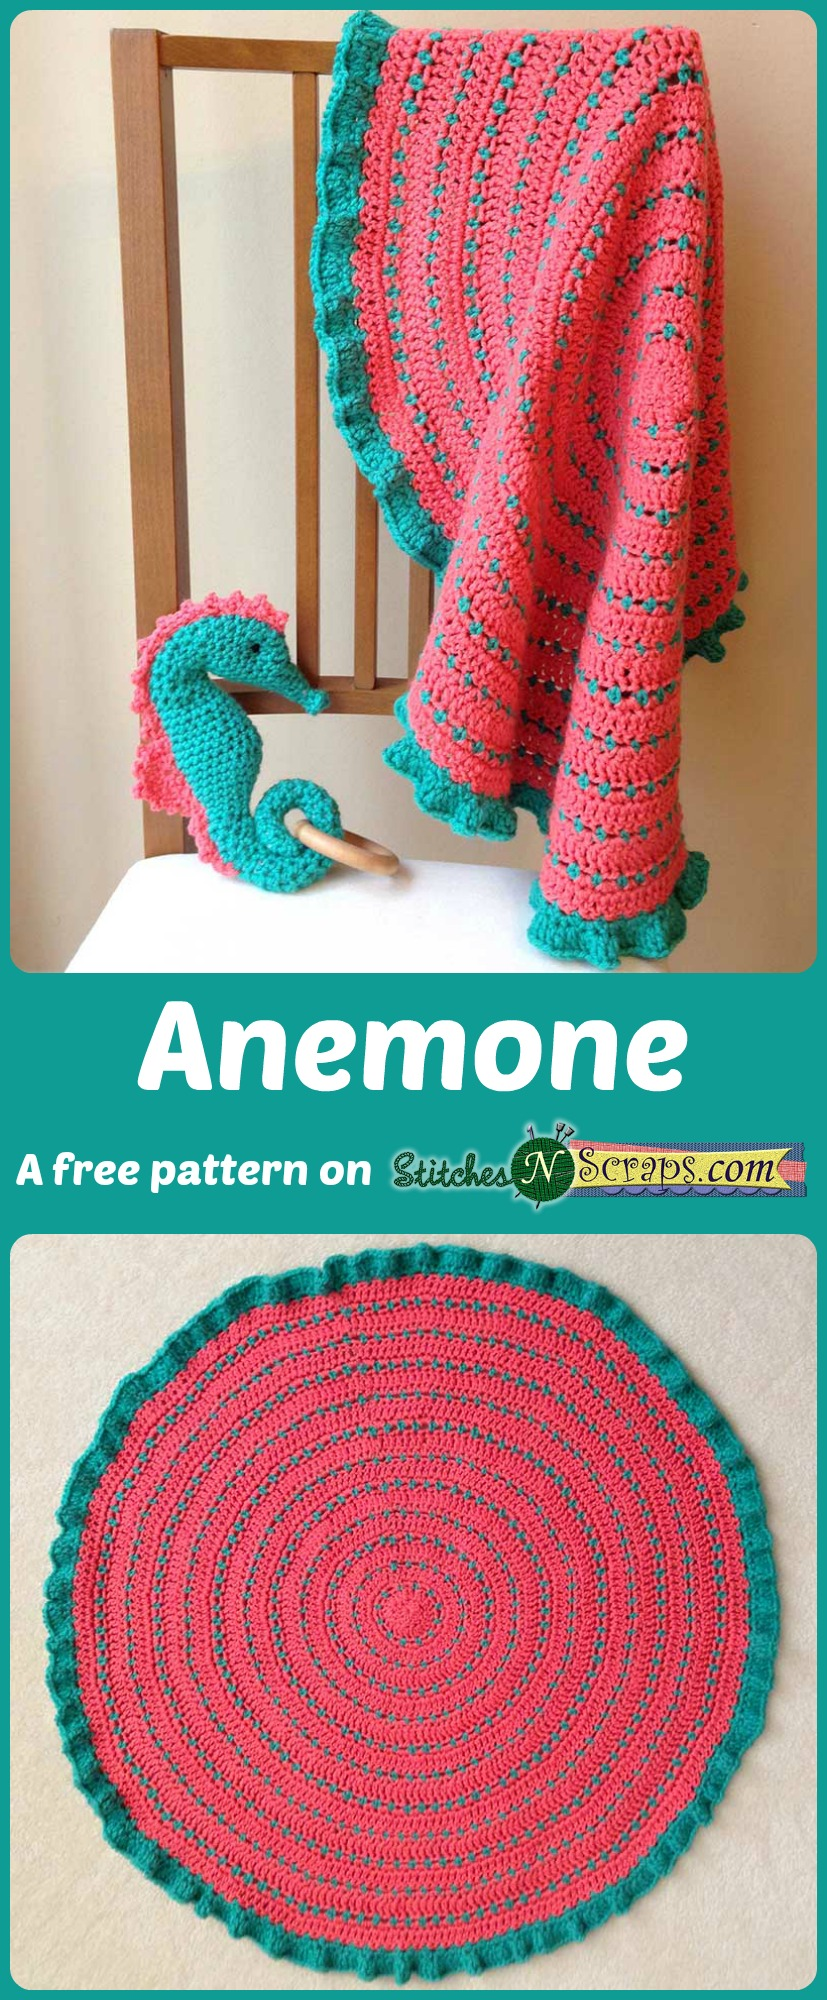 Free Pattern Anemone Stitches N Scraps